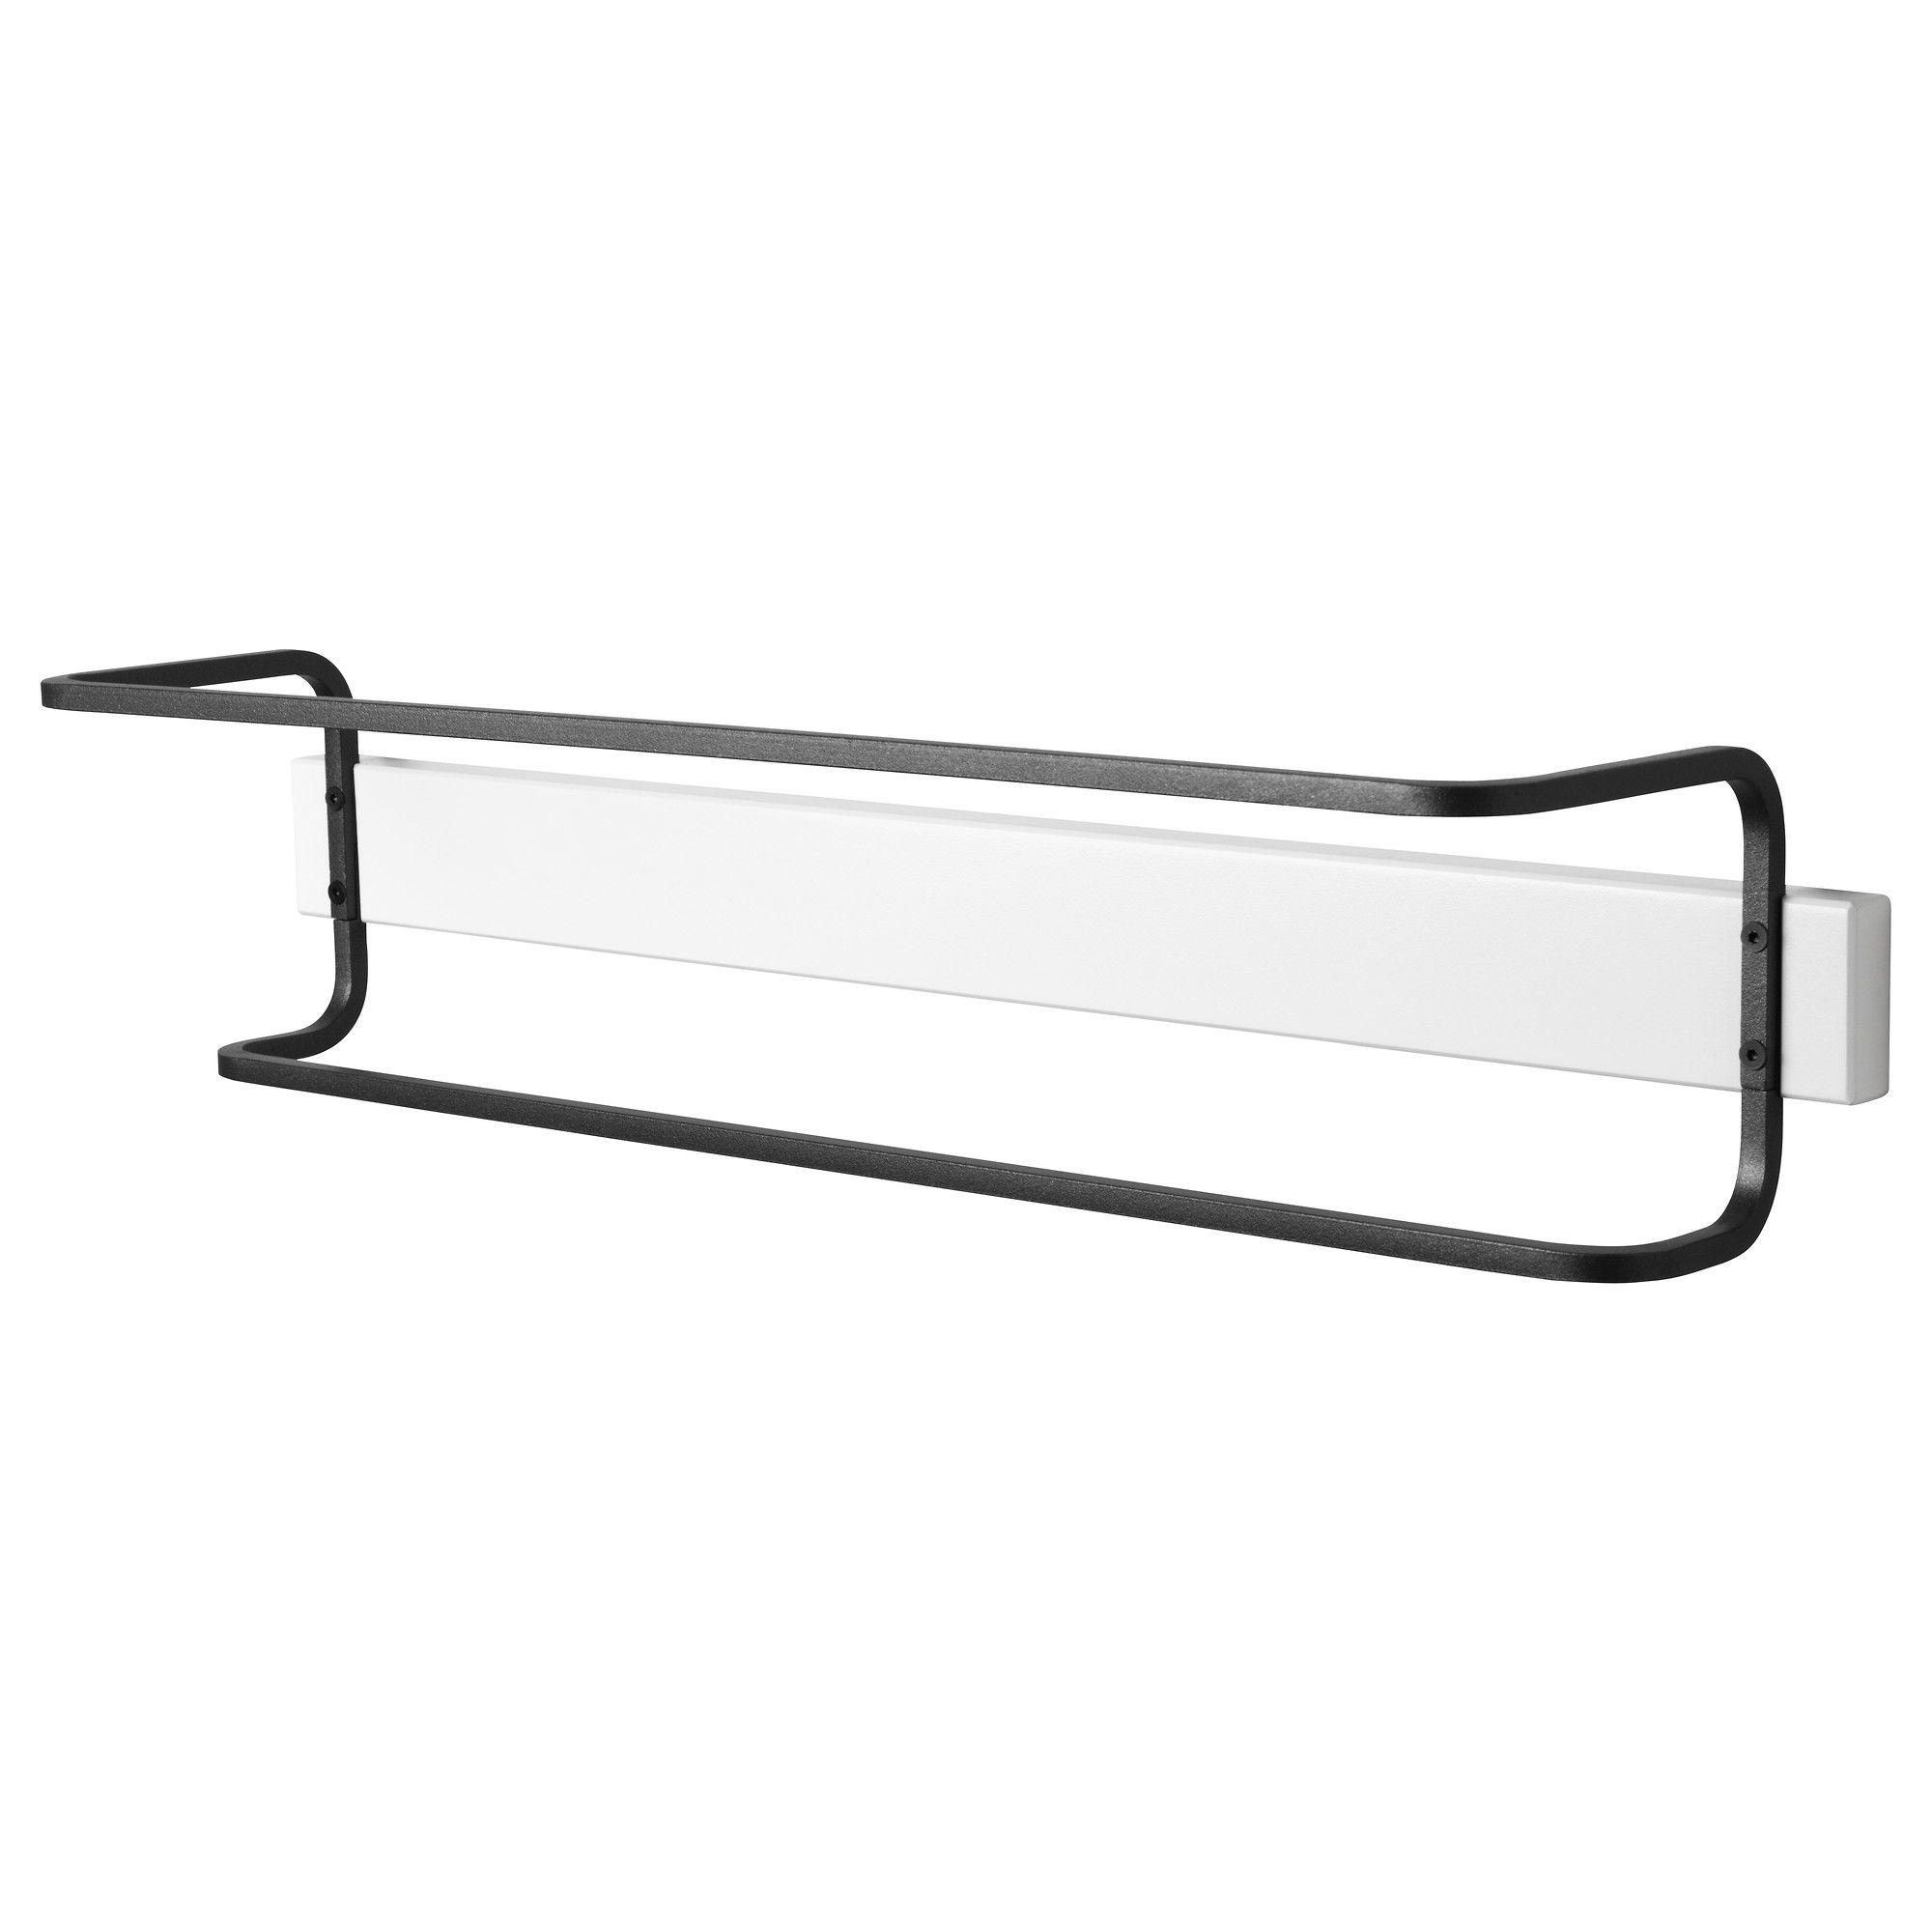 Us Furniture And Home Furnishings Towel Rail